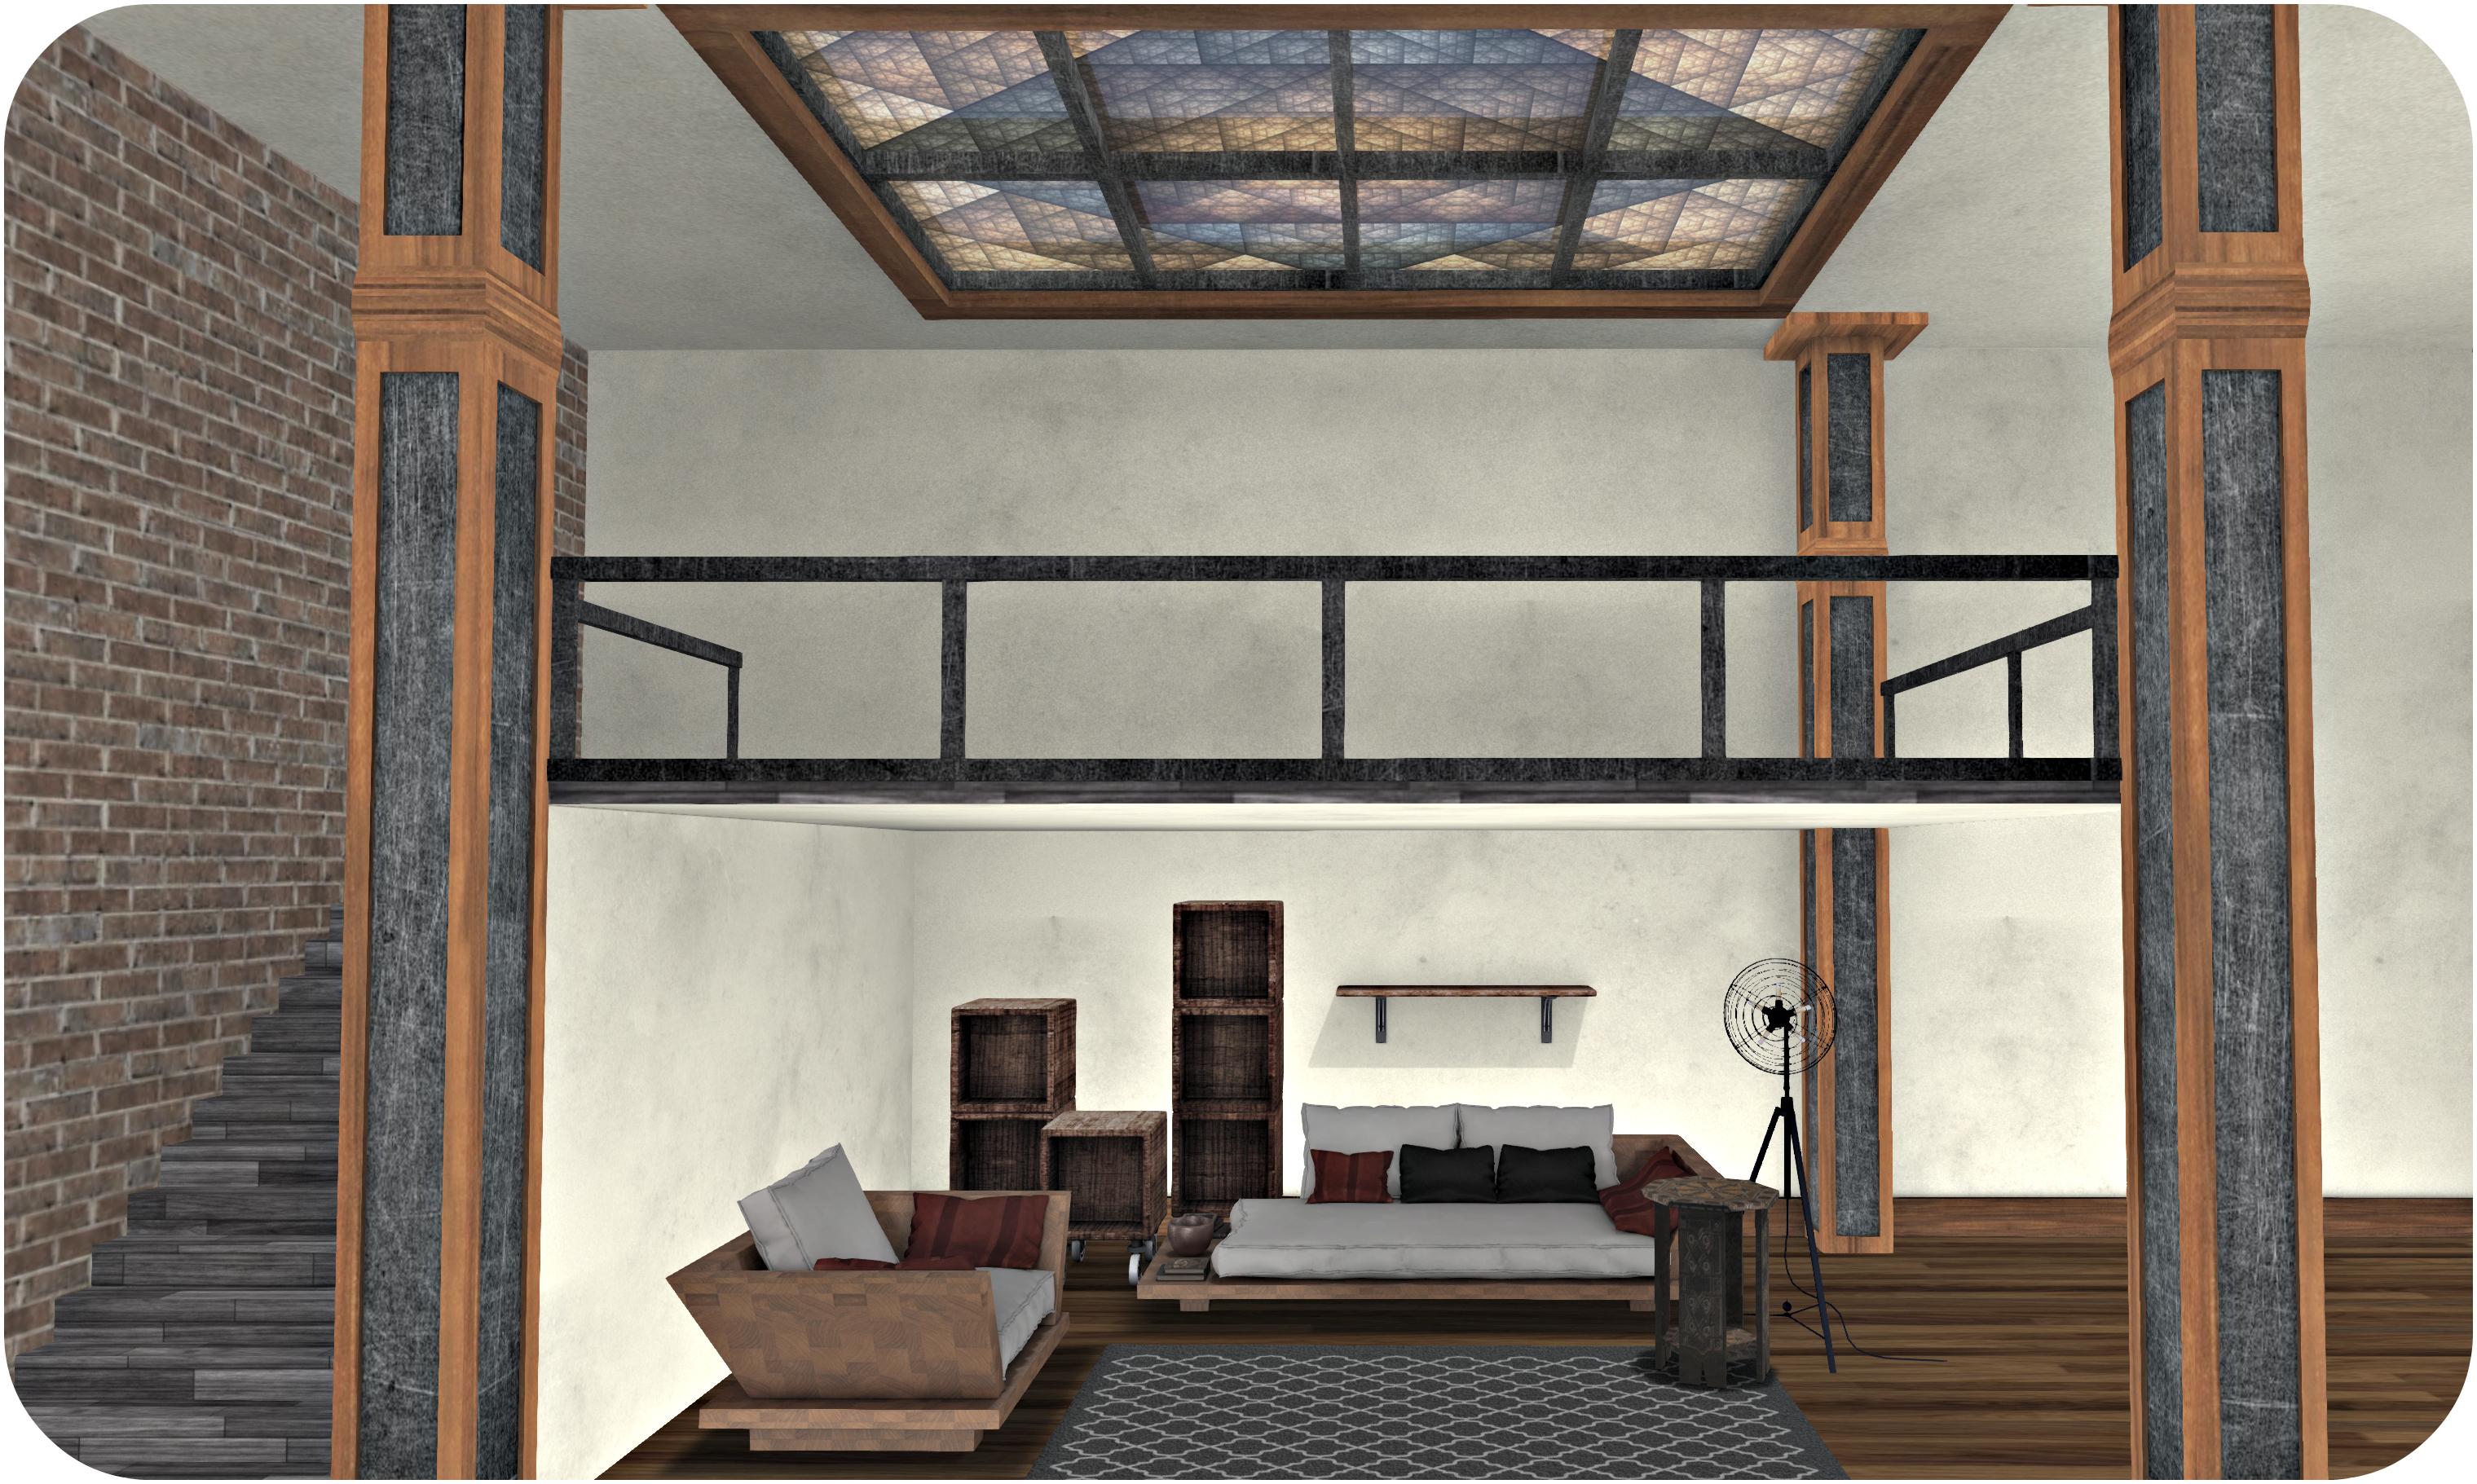 Garage Fair Furniture Shot w loft view 1_cropped